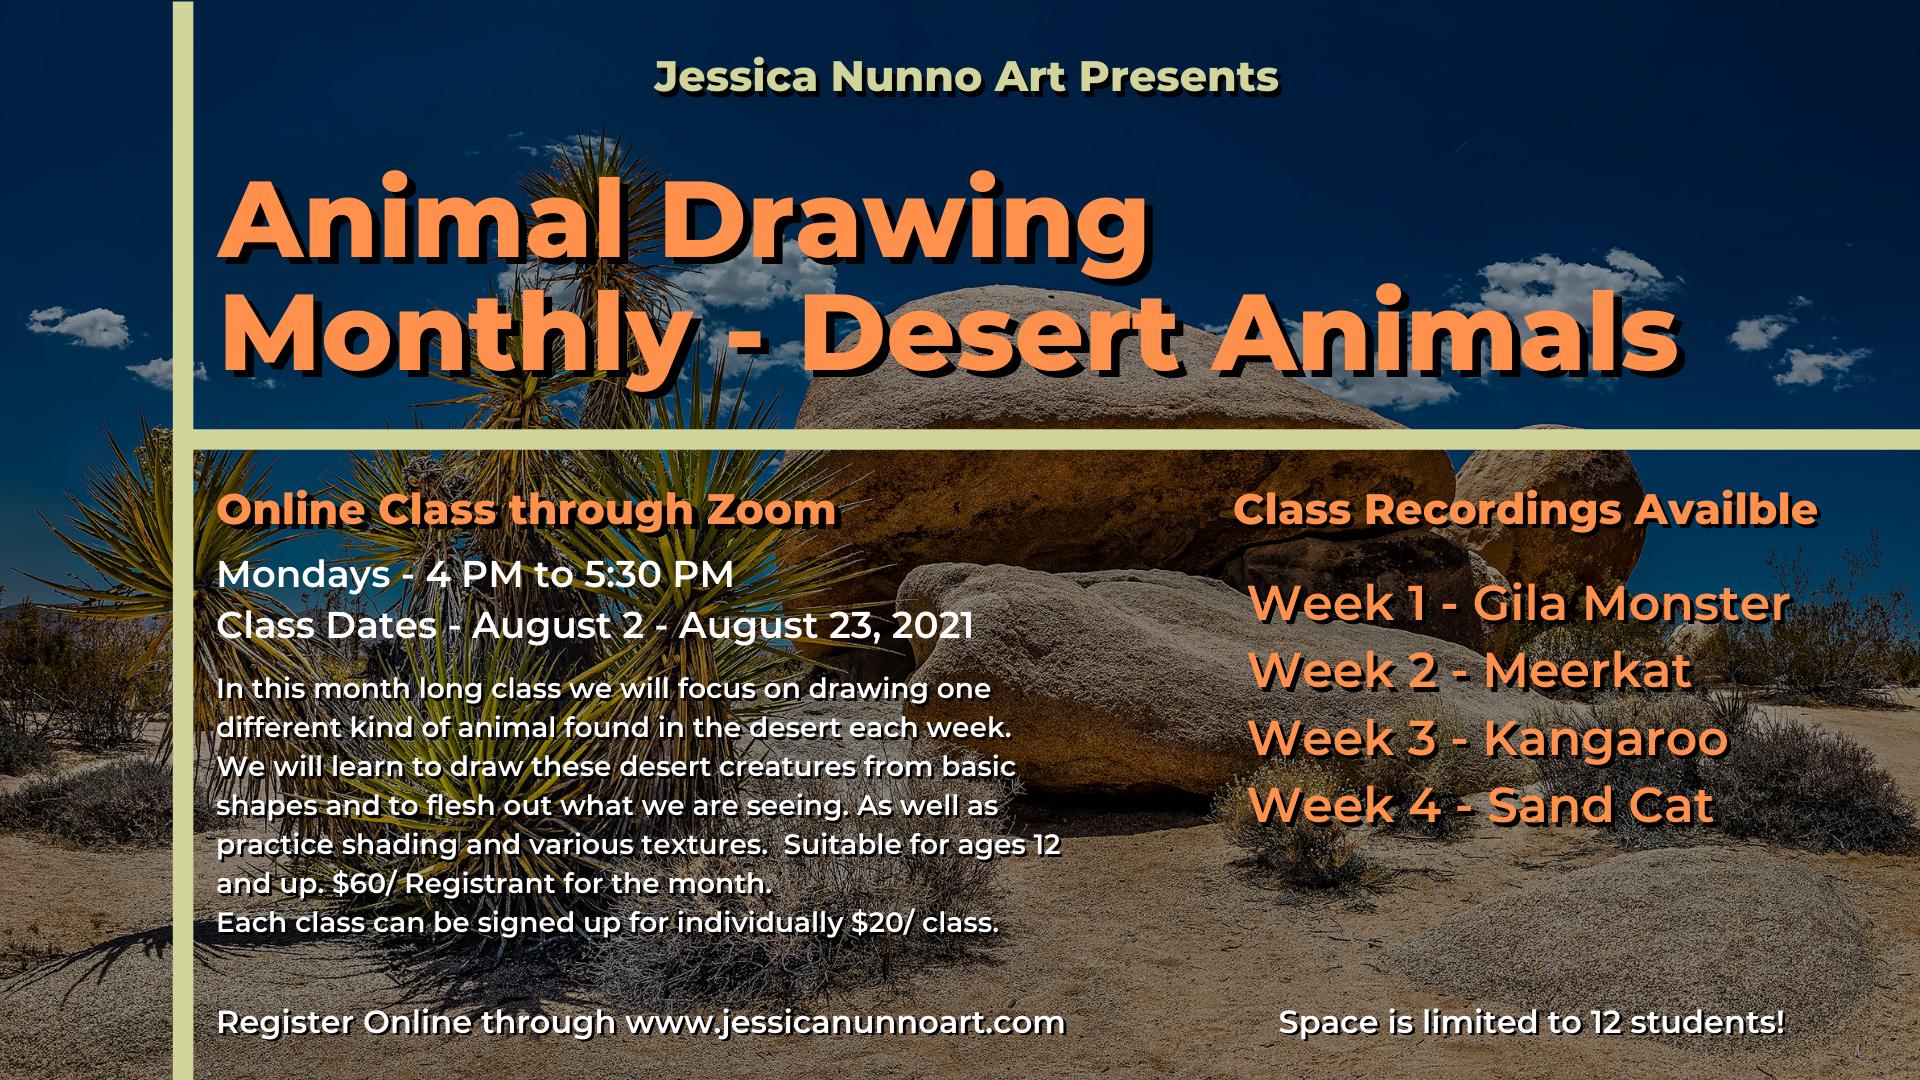 Animal Drawing Monthly - Desert Animals